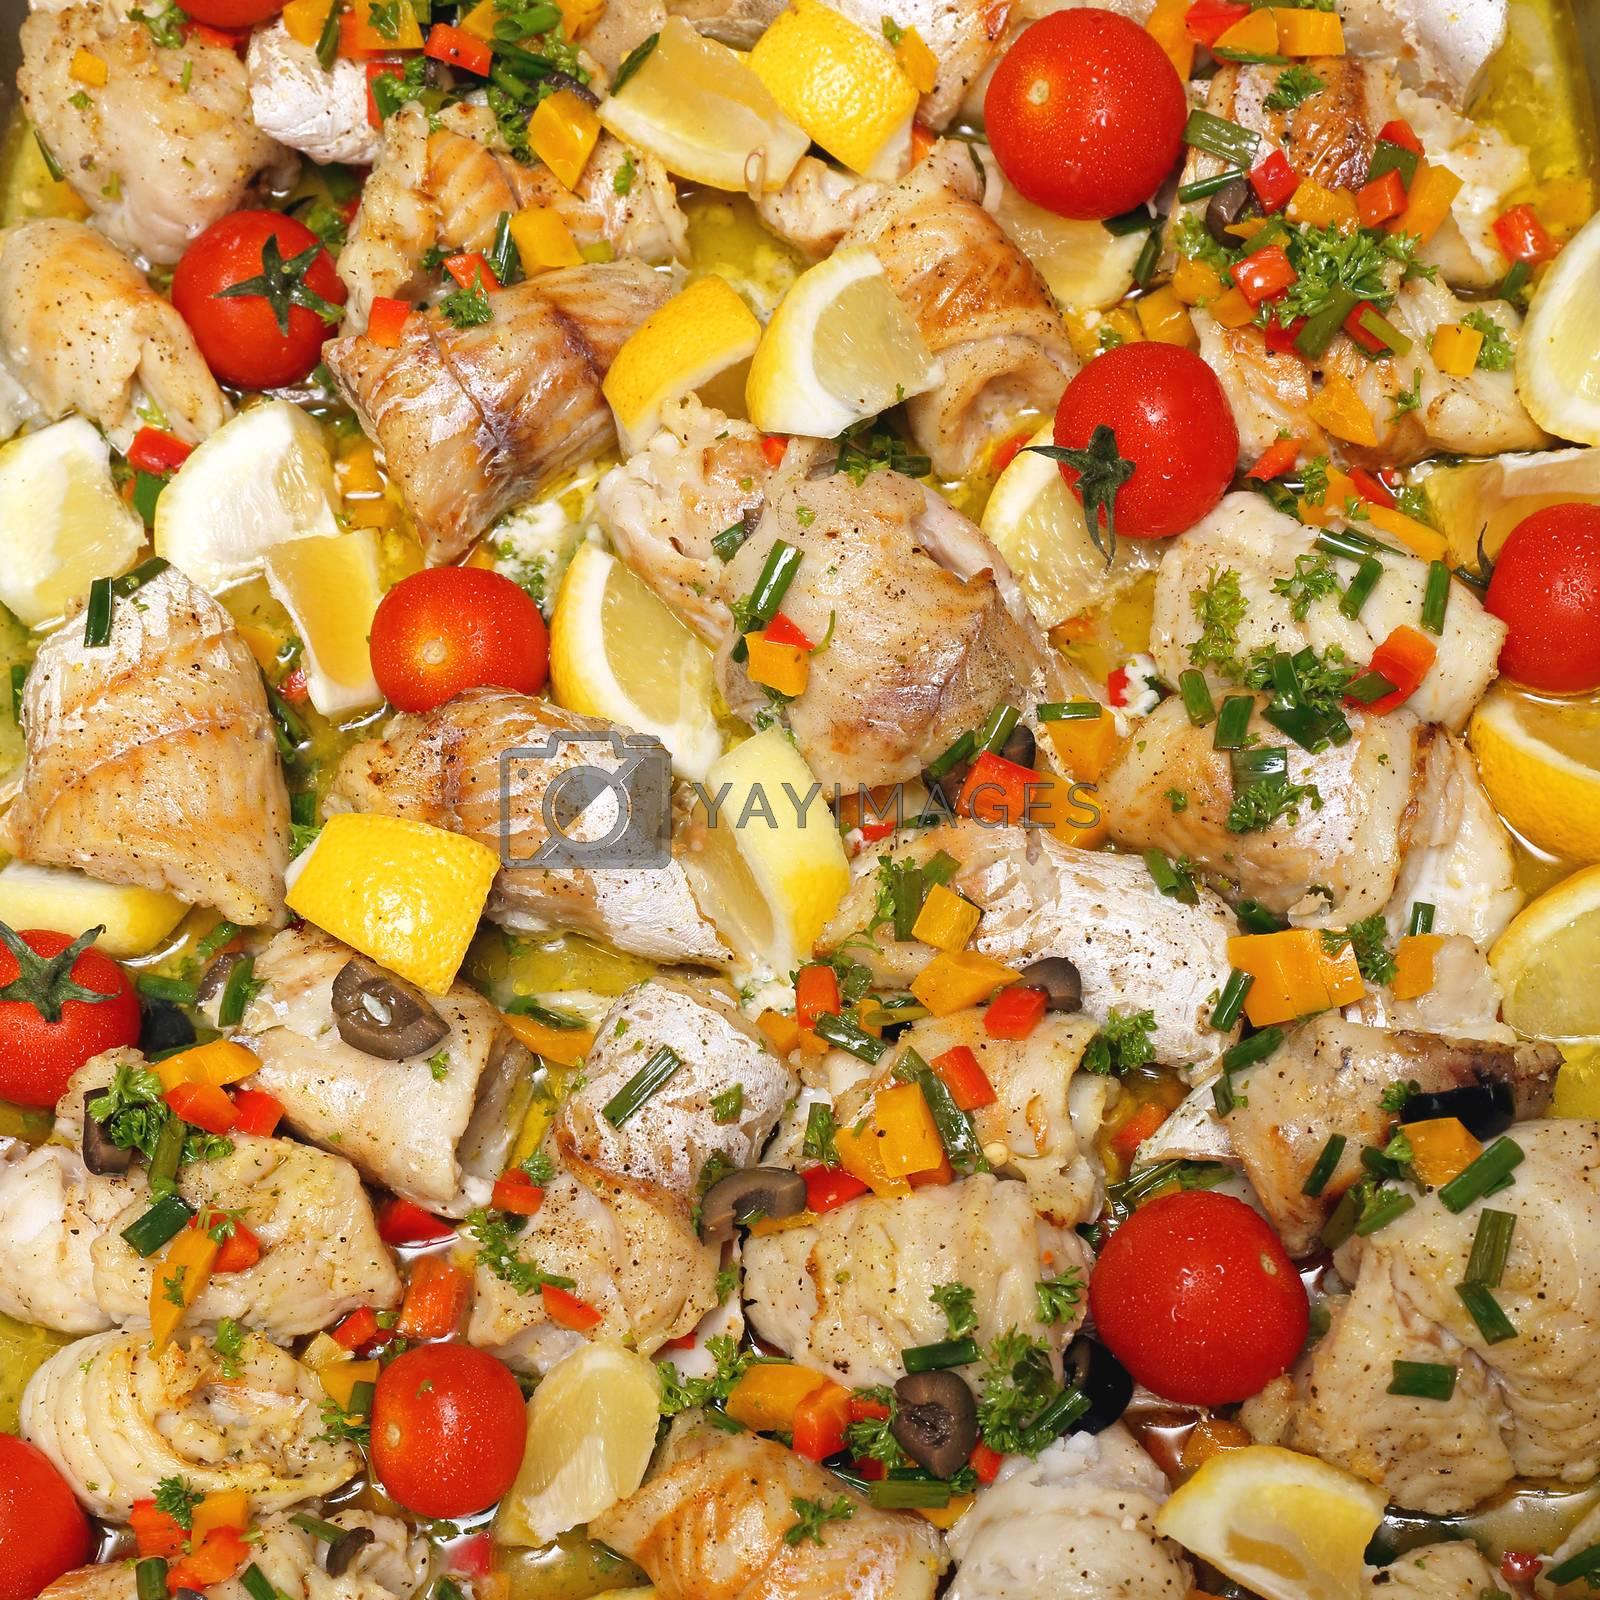 Cod Fish Filets With Herbs Salad